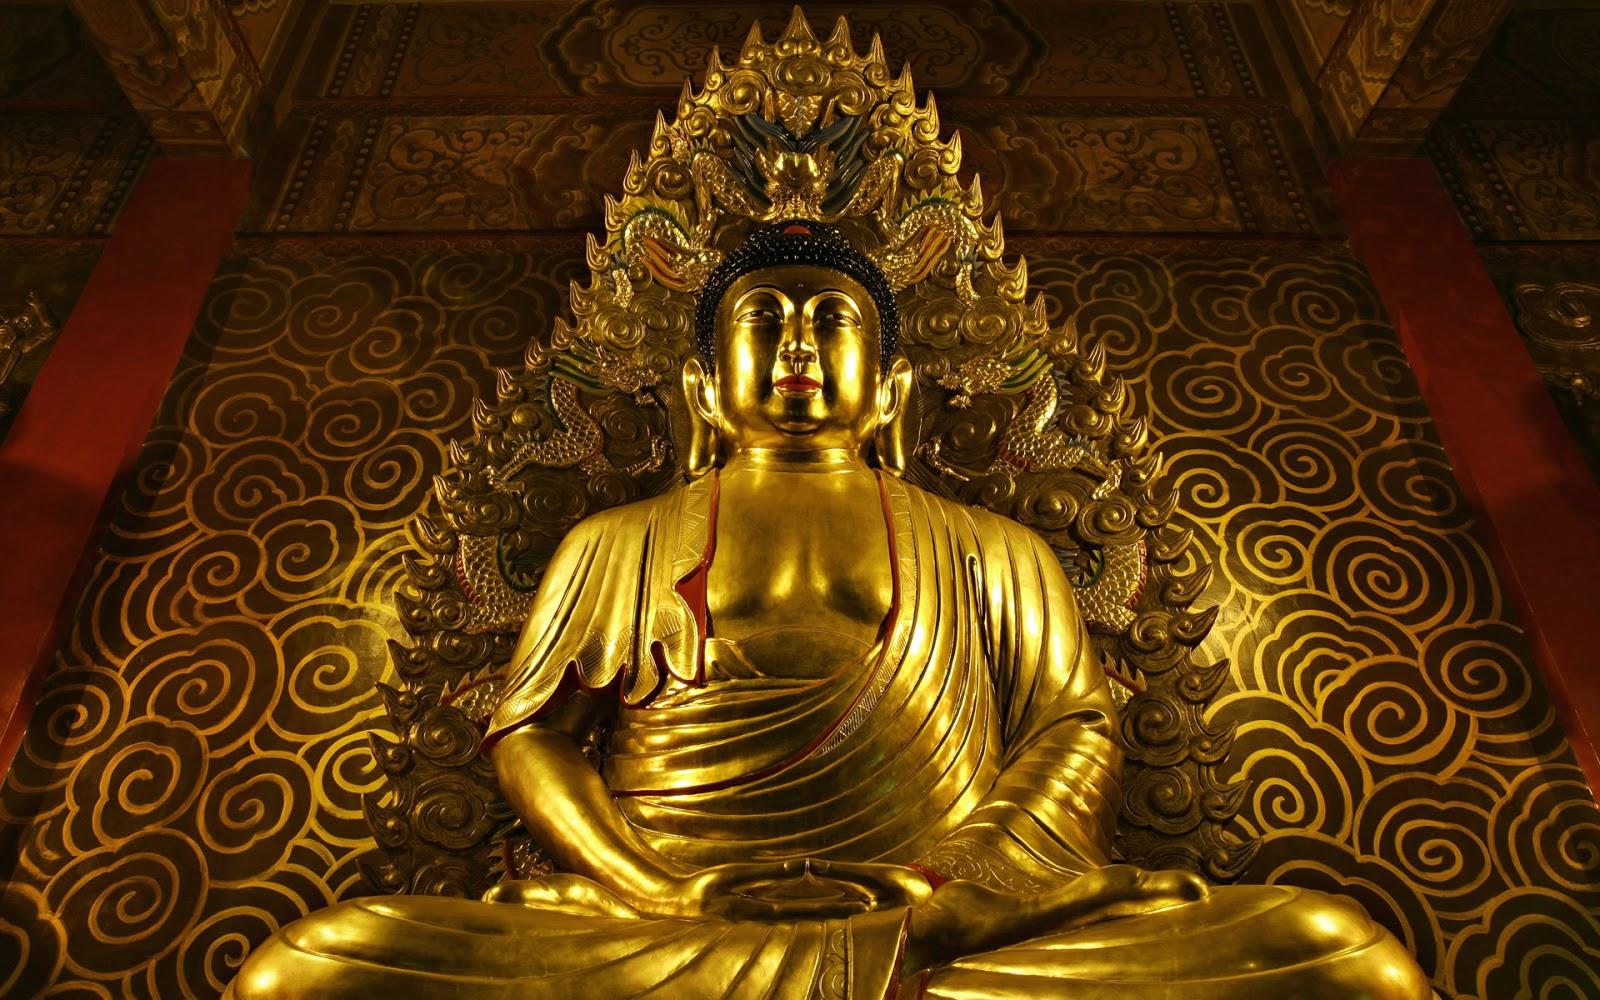 Lord+Buddha+HD+Wallpapers+6.jpg